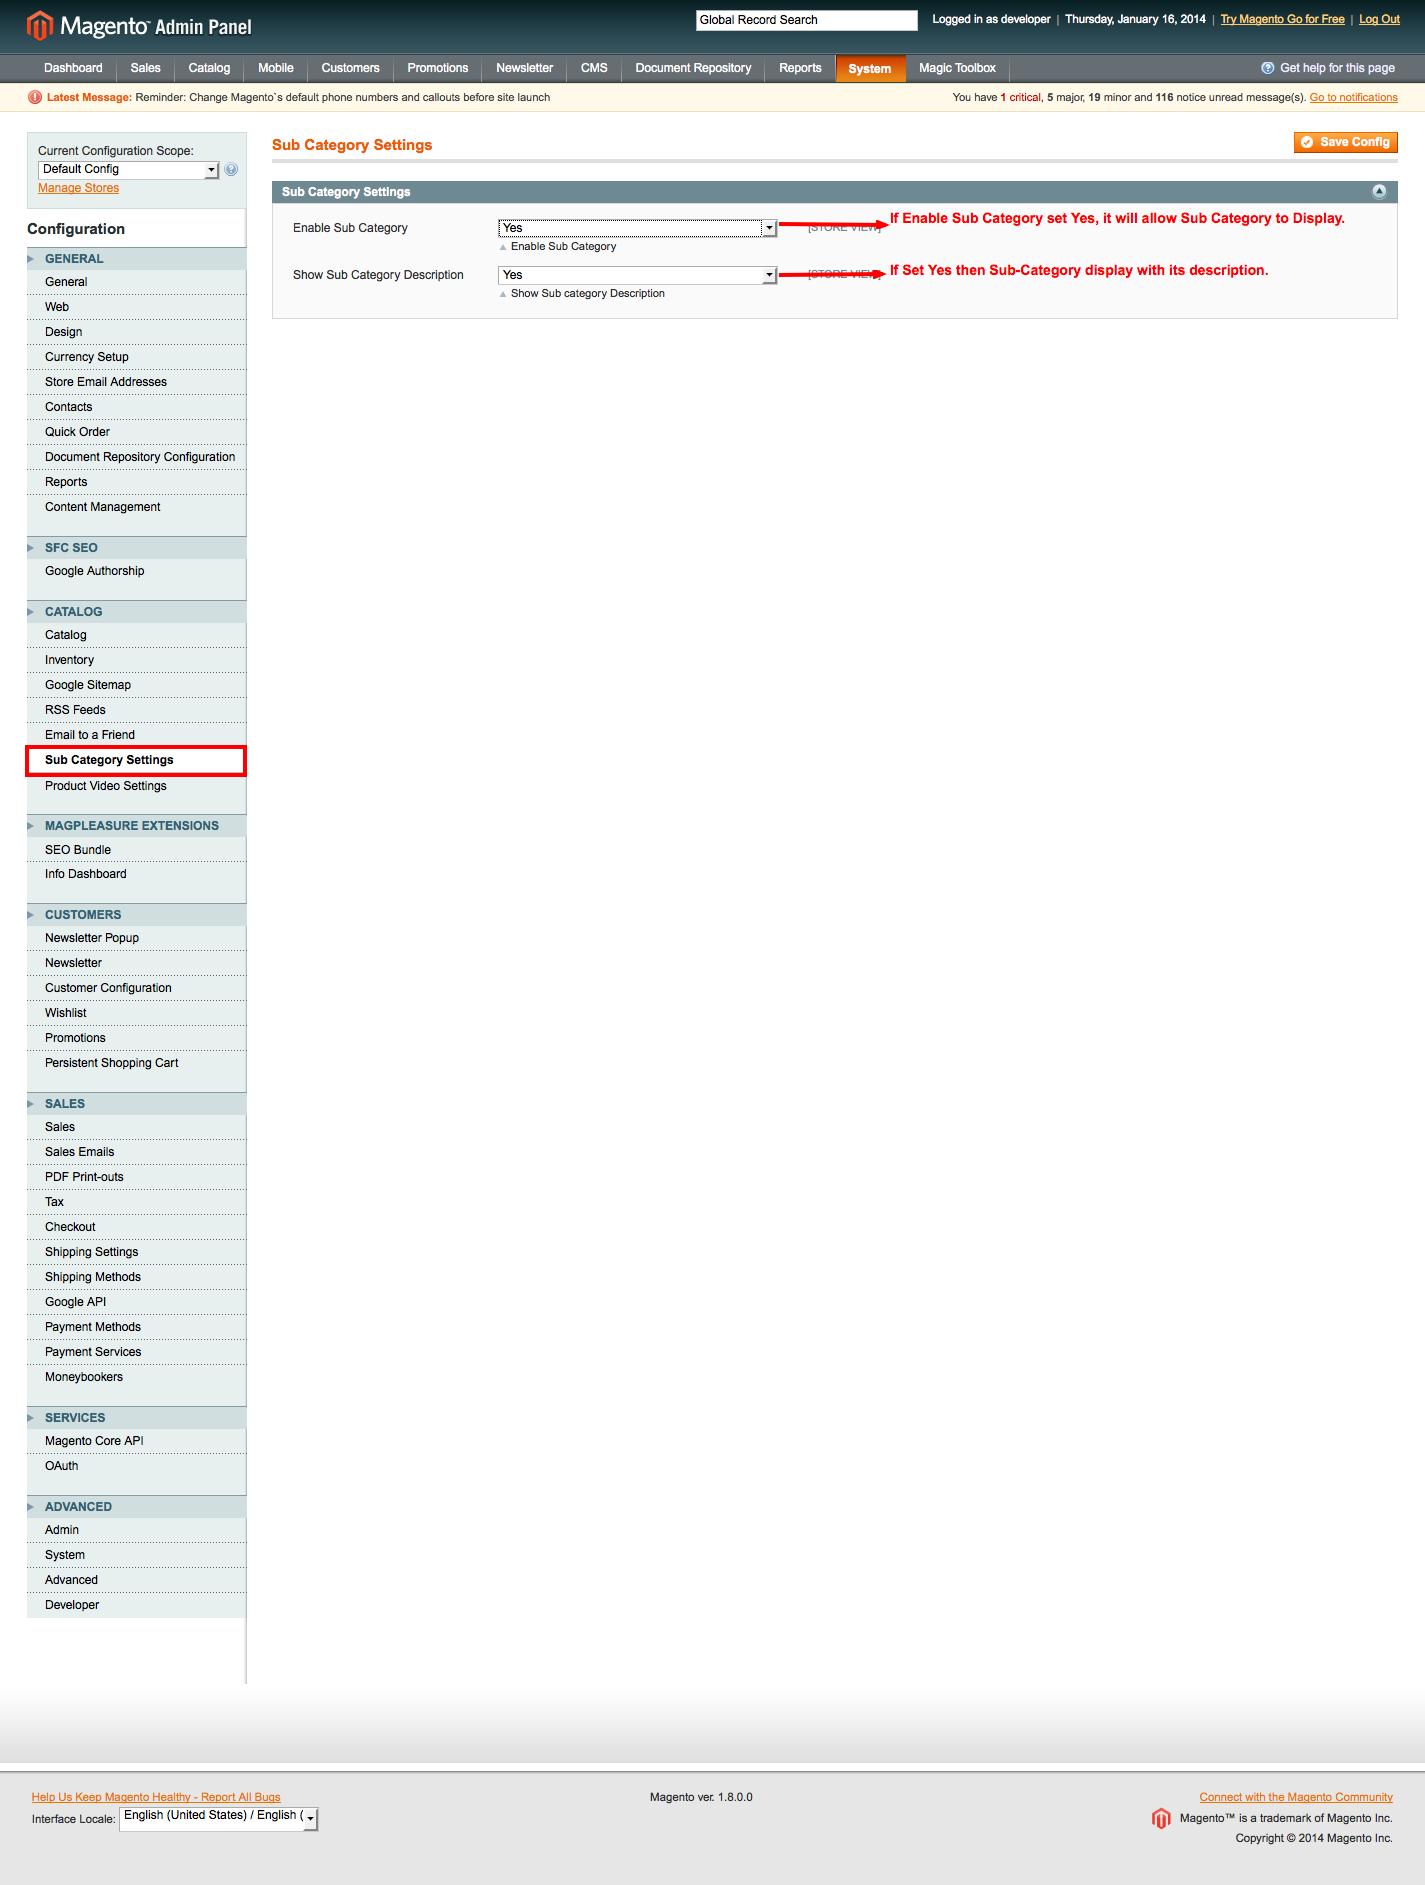 Configuration _ System _ Magento Admin 2014-01-16 14-02-48